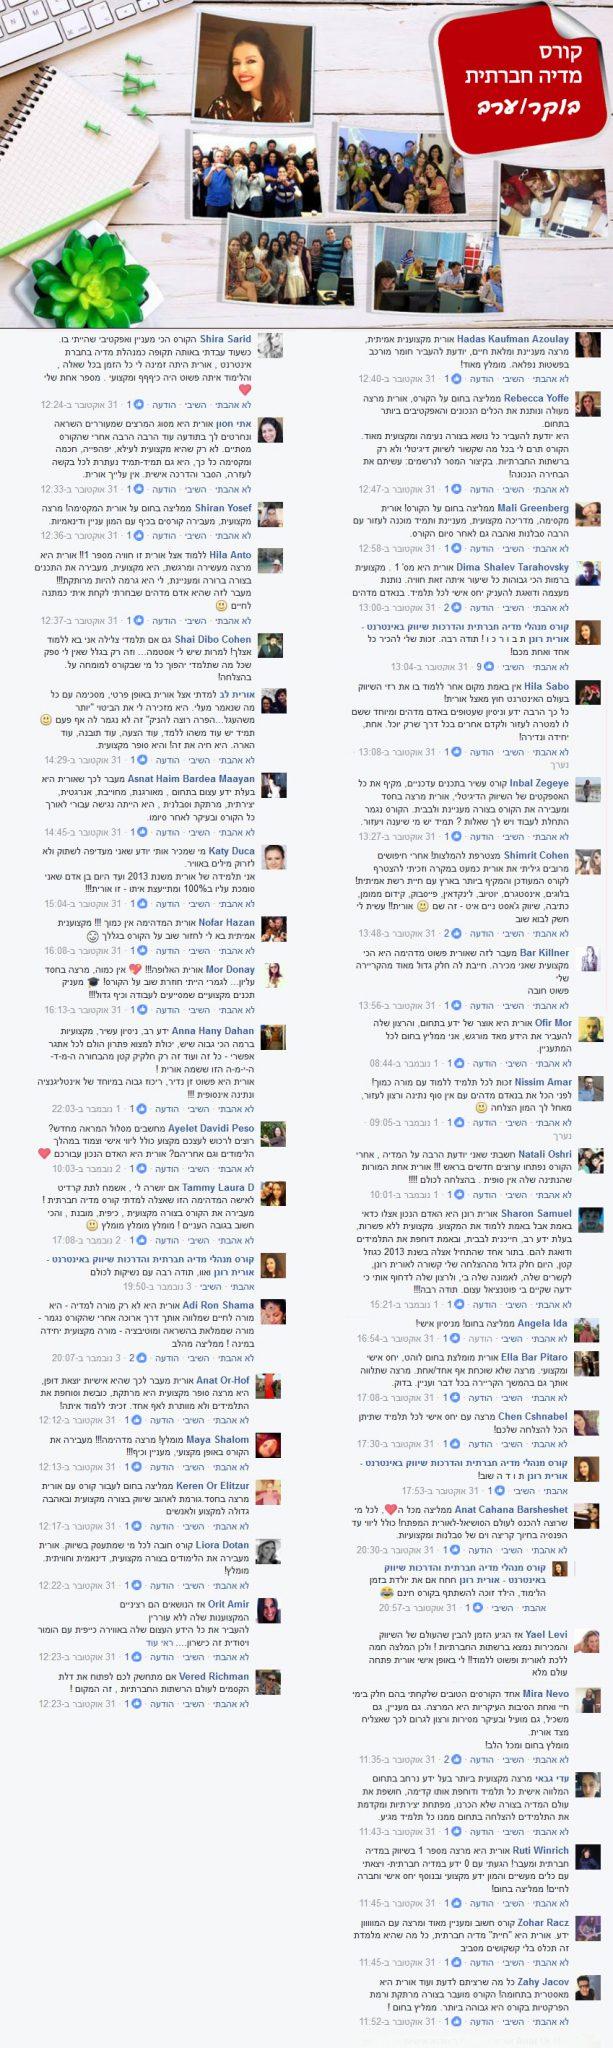 social-media-course-2016-comments-orit-shira-ronen